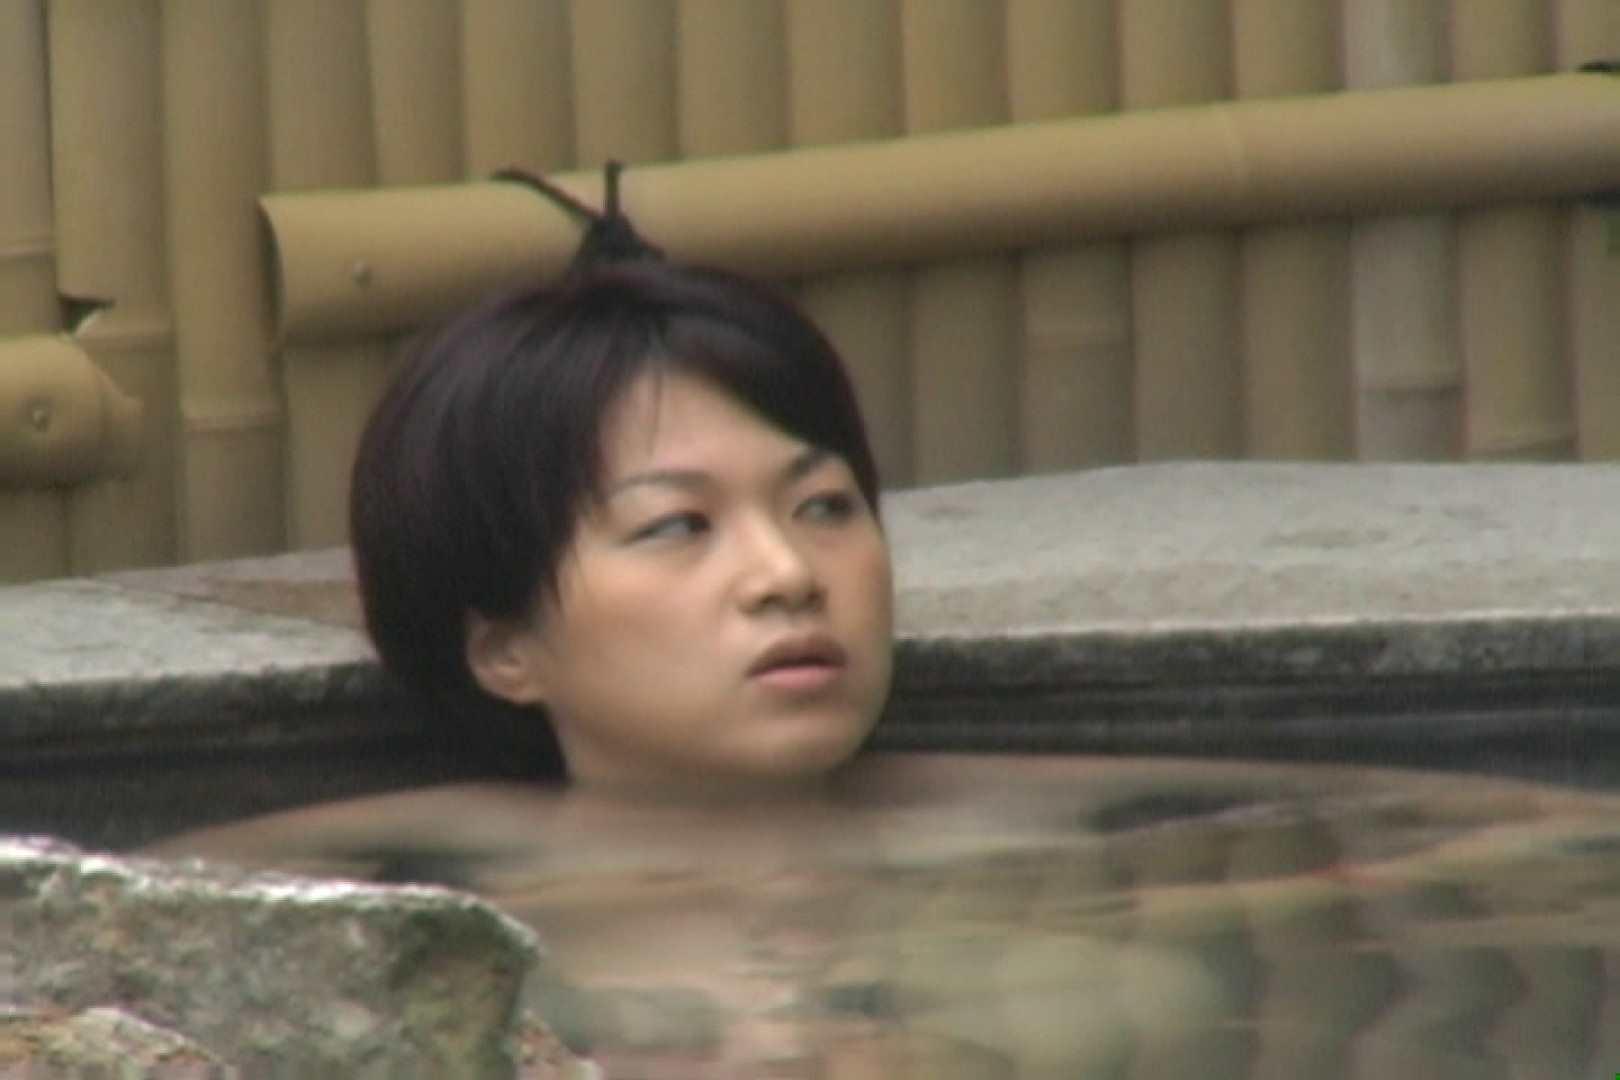 Aquaな露天風呂Vol.624 OLのエロ生活   露天風呂  41連発 25